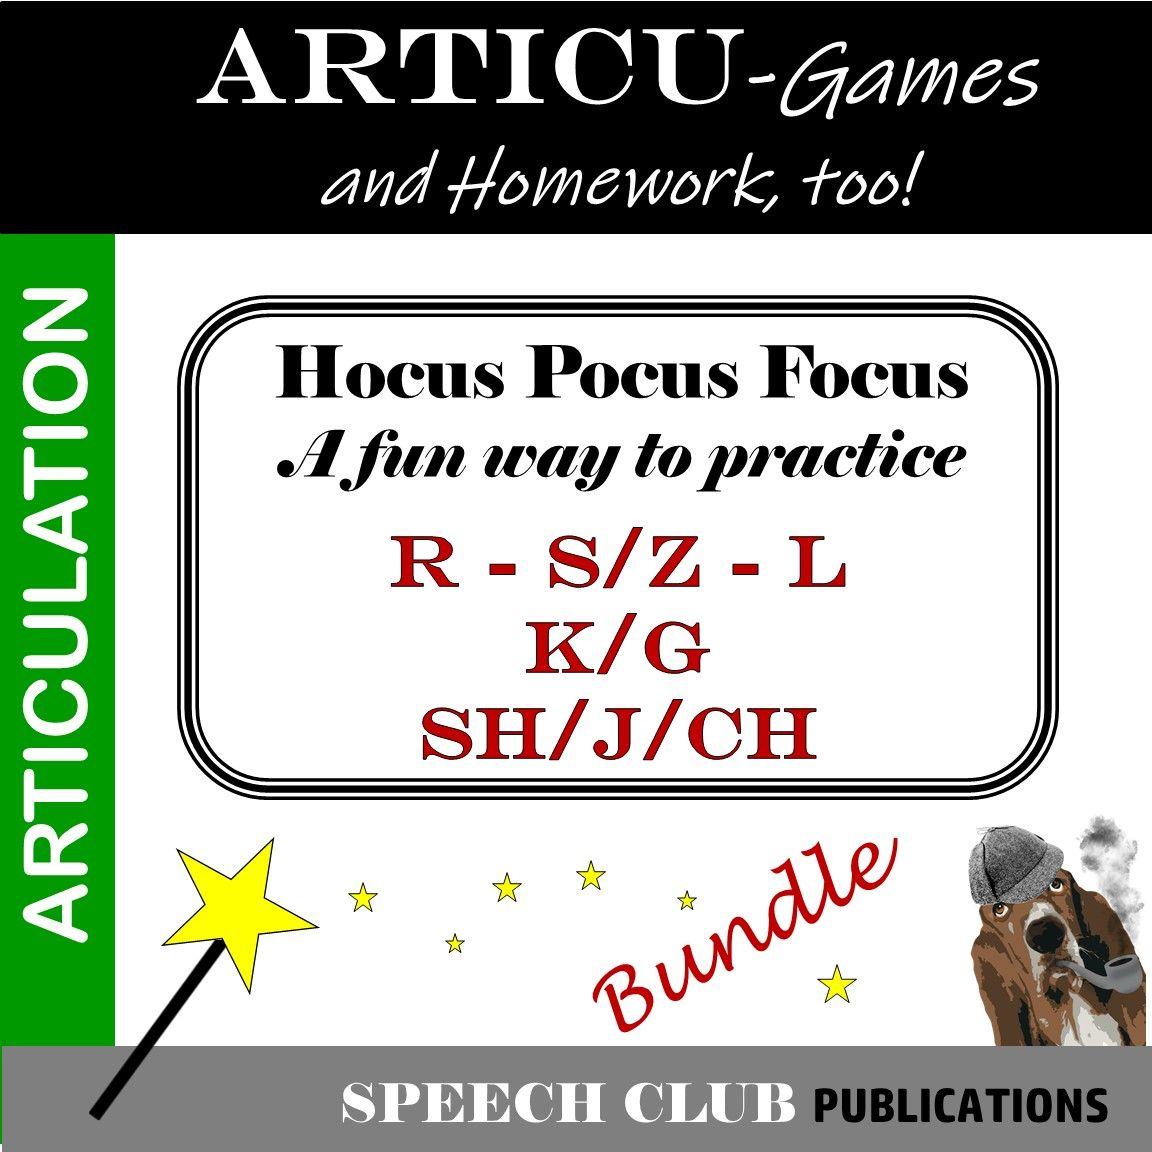 Hocus Pocus Focus Is A Series Of Articulation Card Games